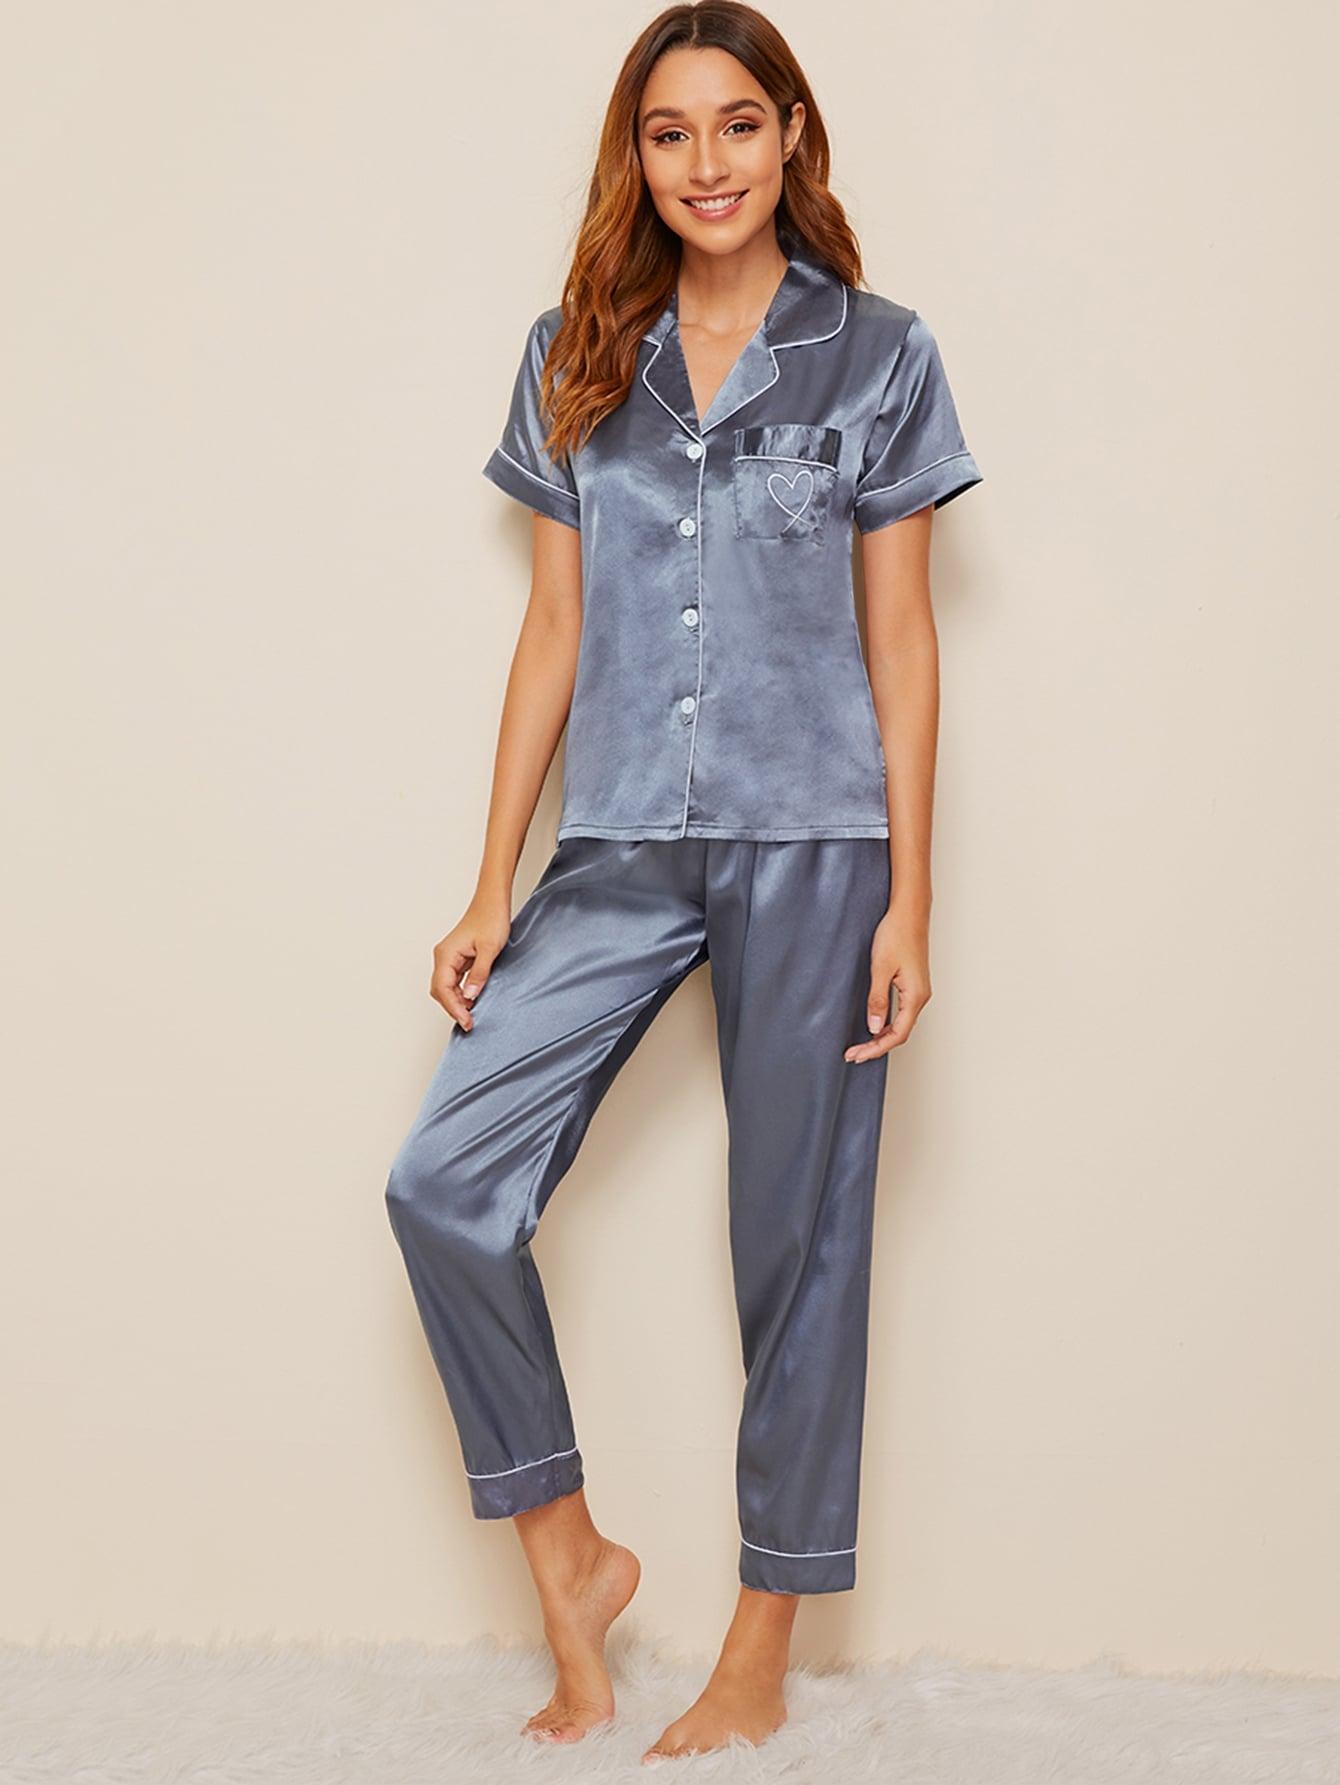 Фото - Атласная пижама с пуговицами и вышивкой от SheIn цвет синие